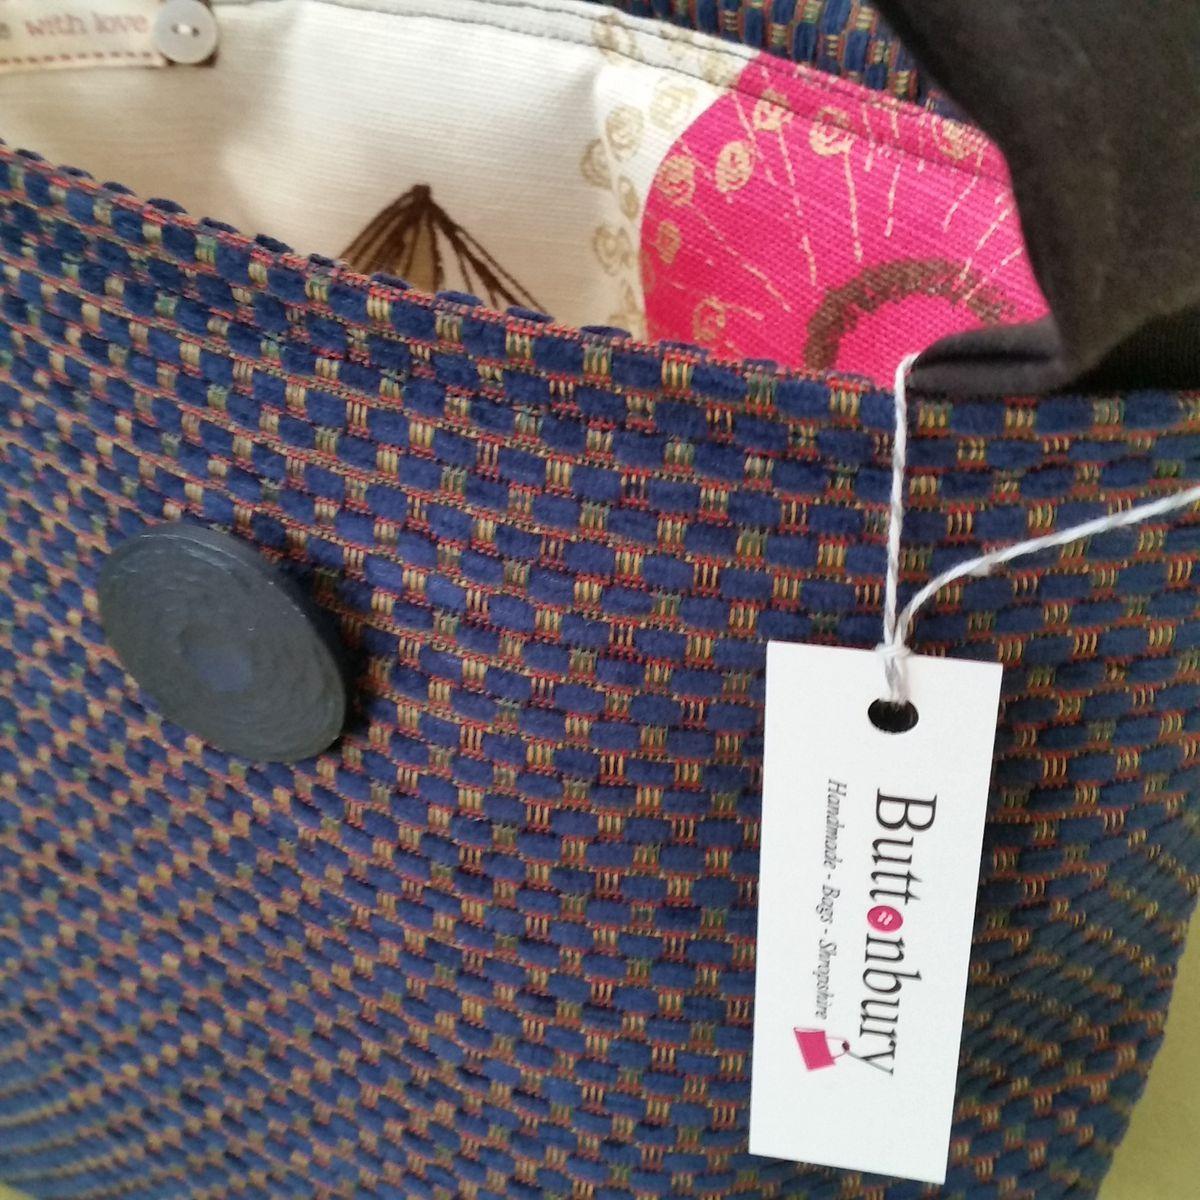 One of Sandra's bags